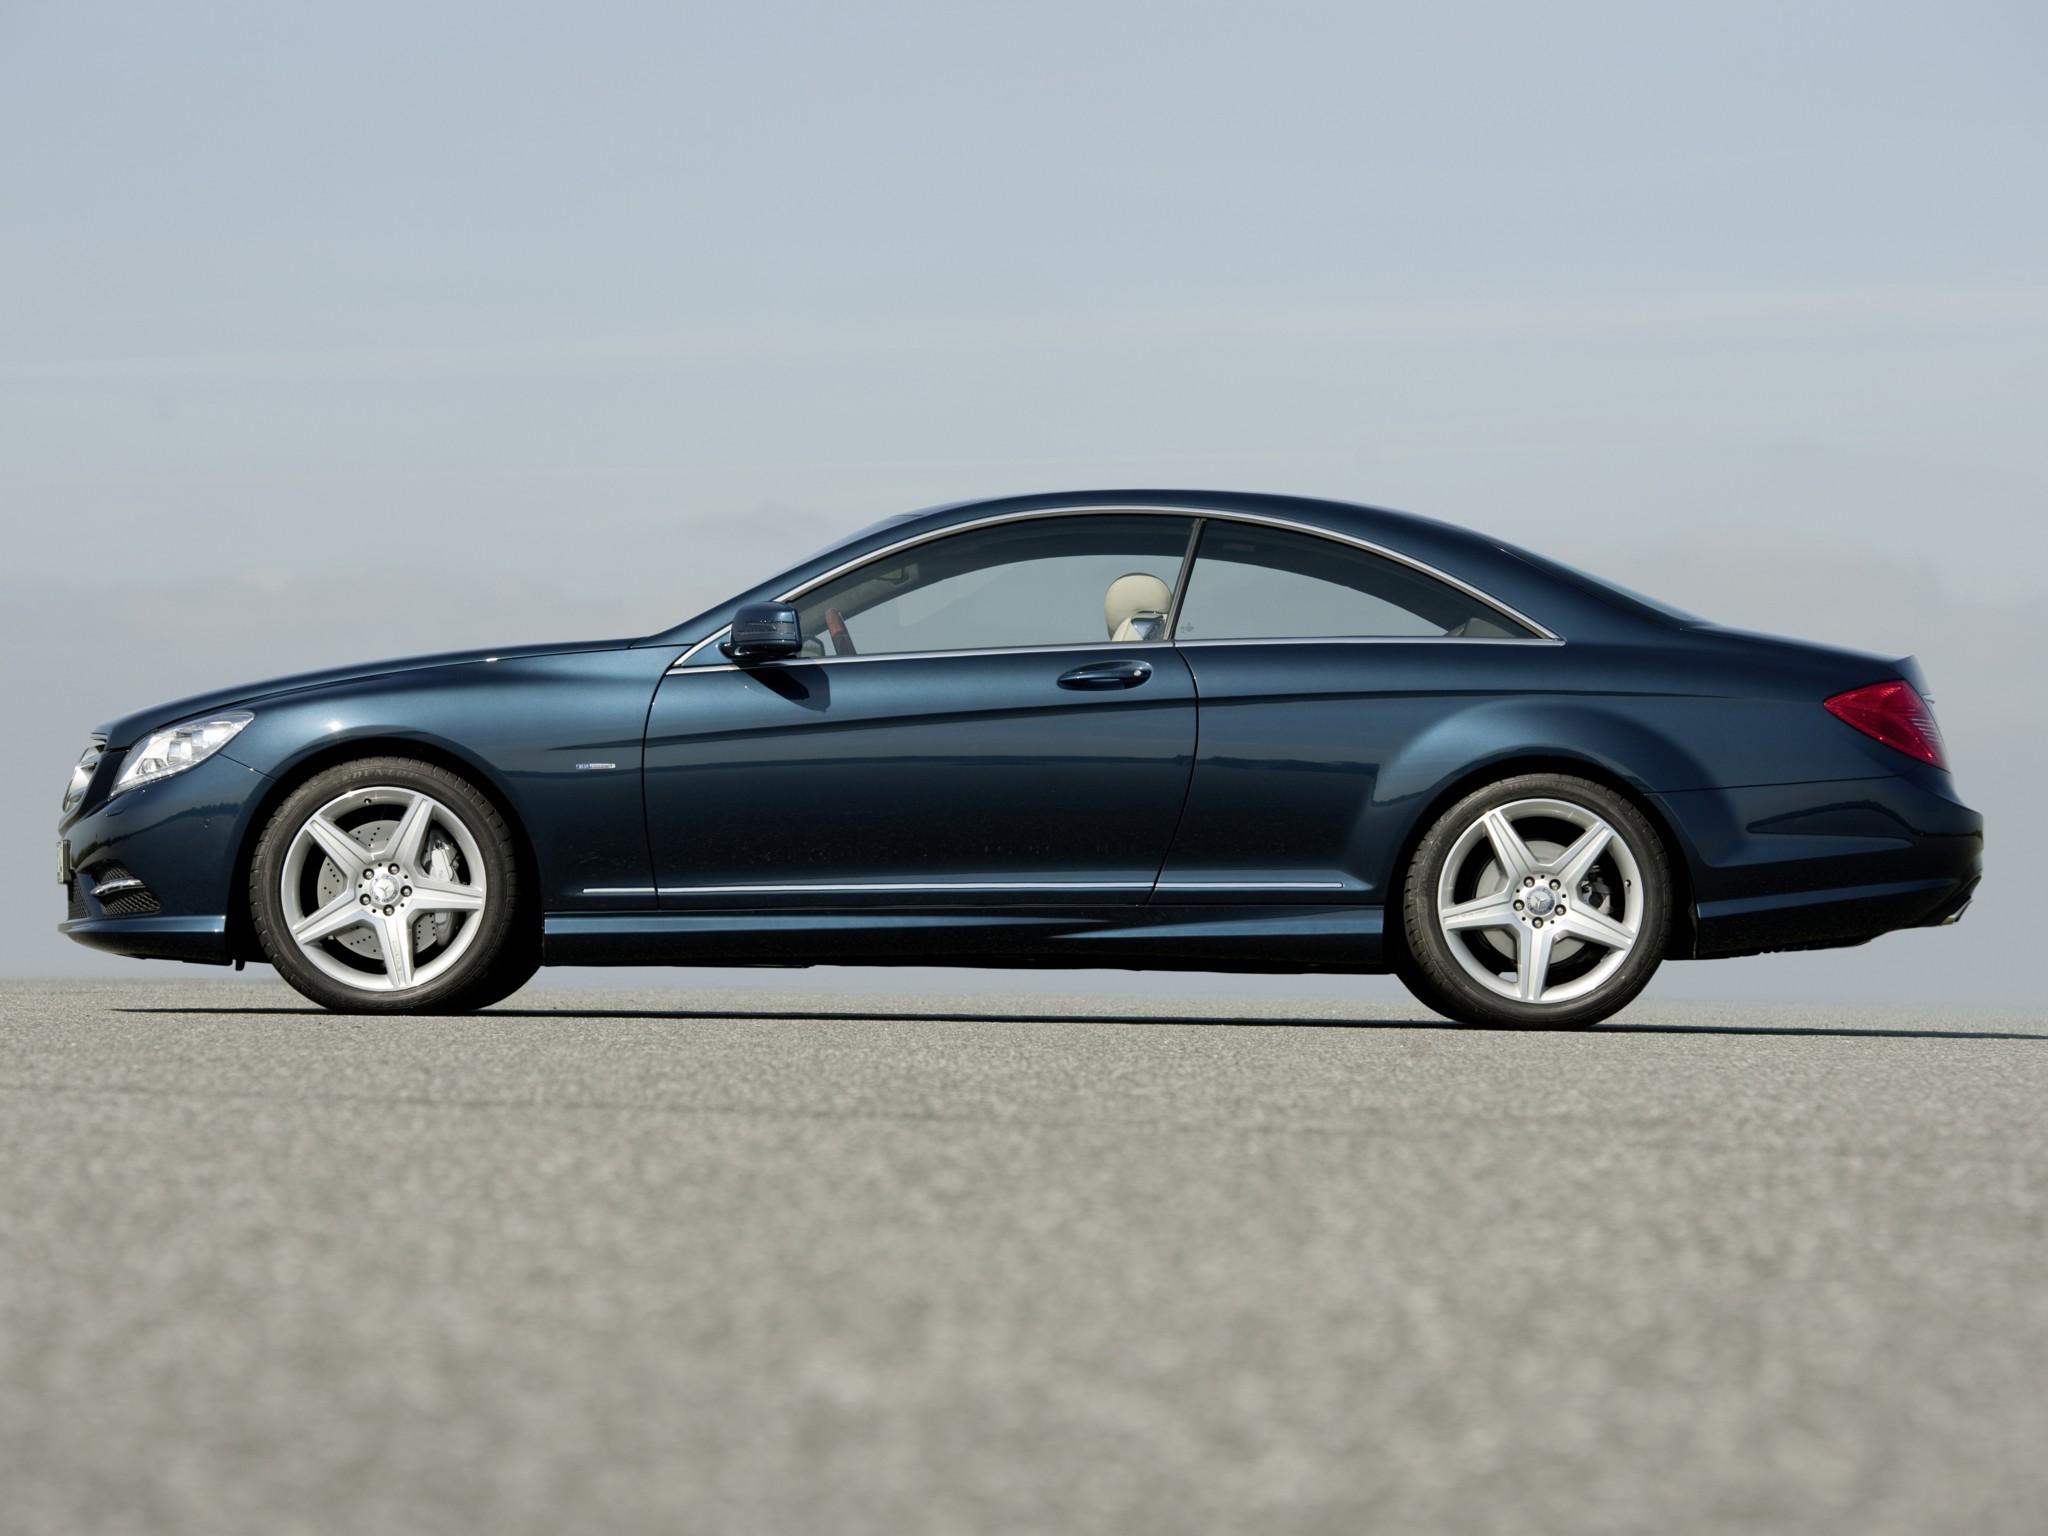 Mercedes benz cl c216 specs 2010 2011 2012 2013 for Cl mercedes benz